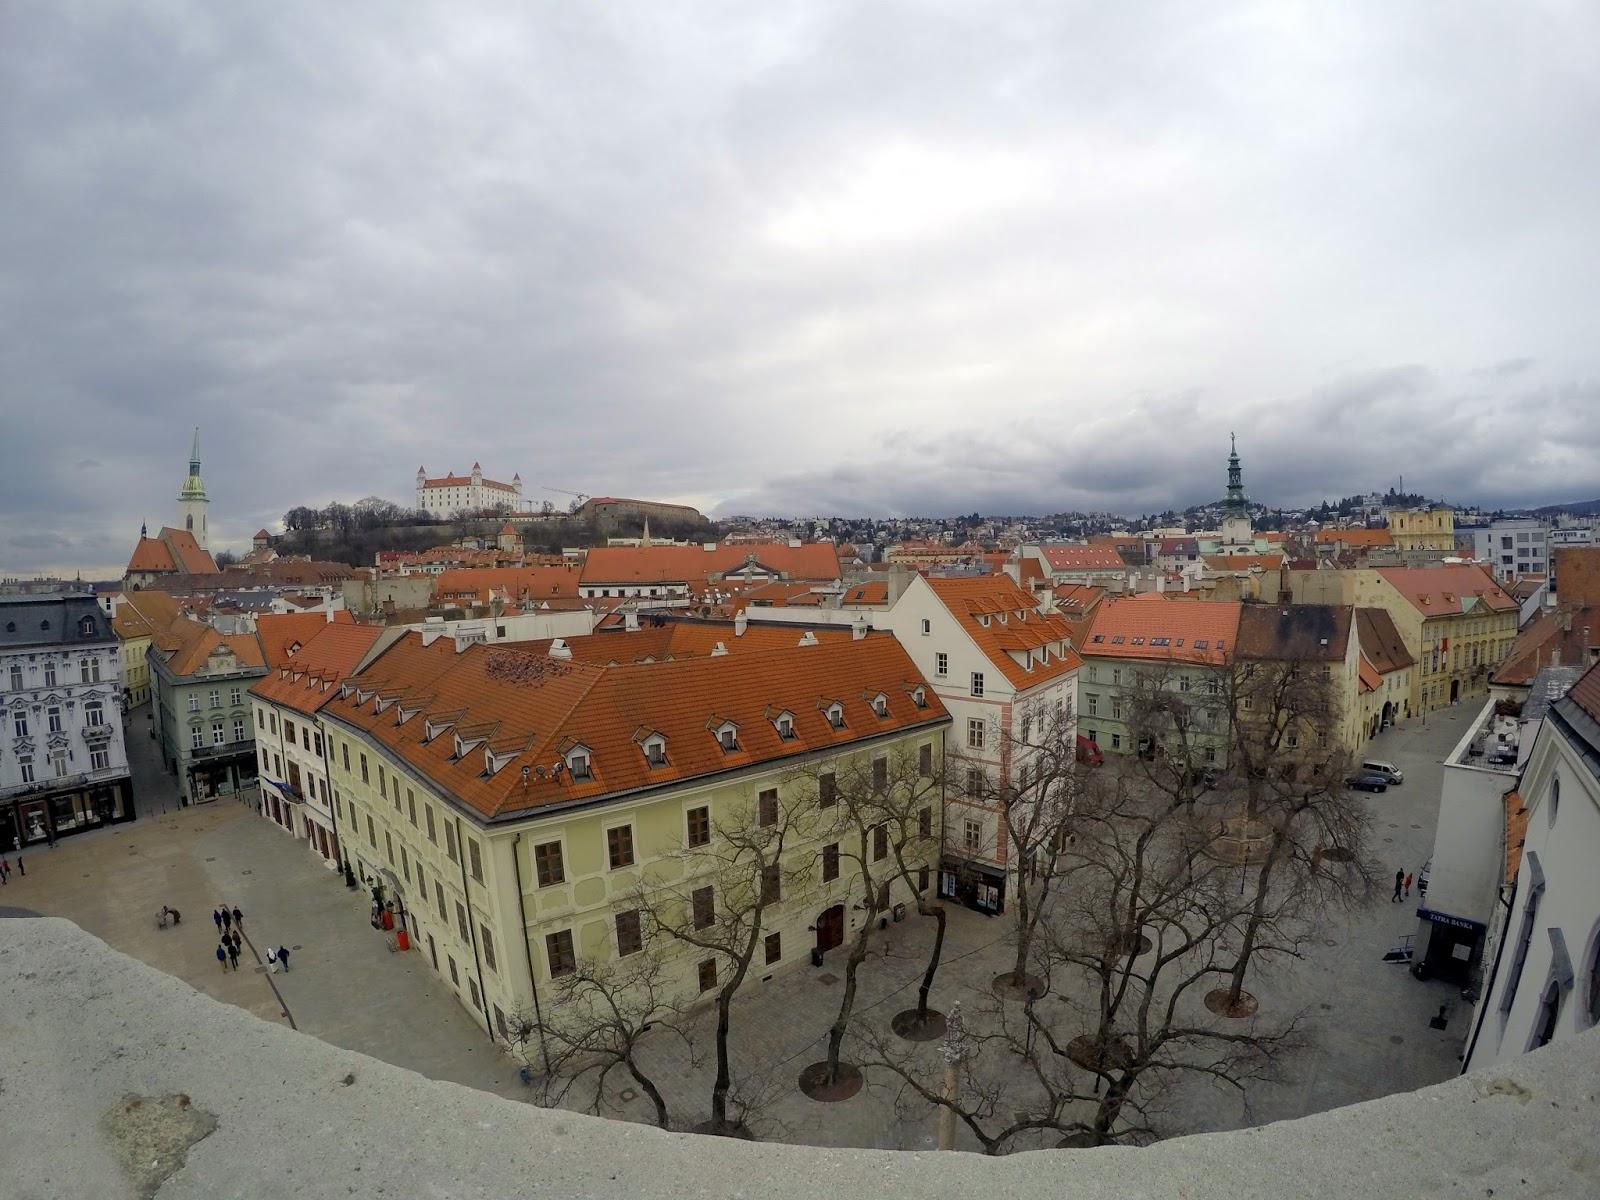 Slovakia, Bratislava, off the beaten track, eastern europe, eu, historical city, on the danube, ufo, bridge, communist, old town hall view